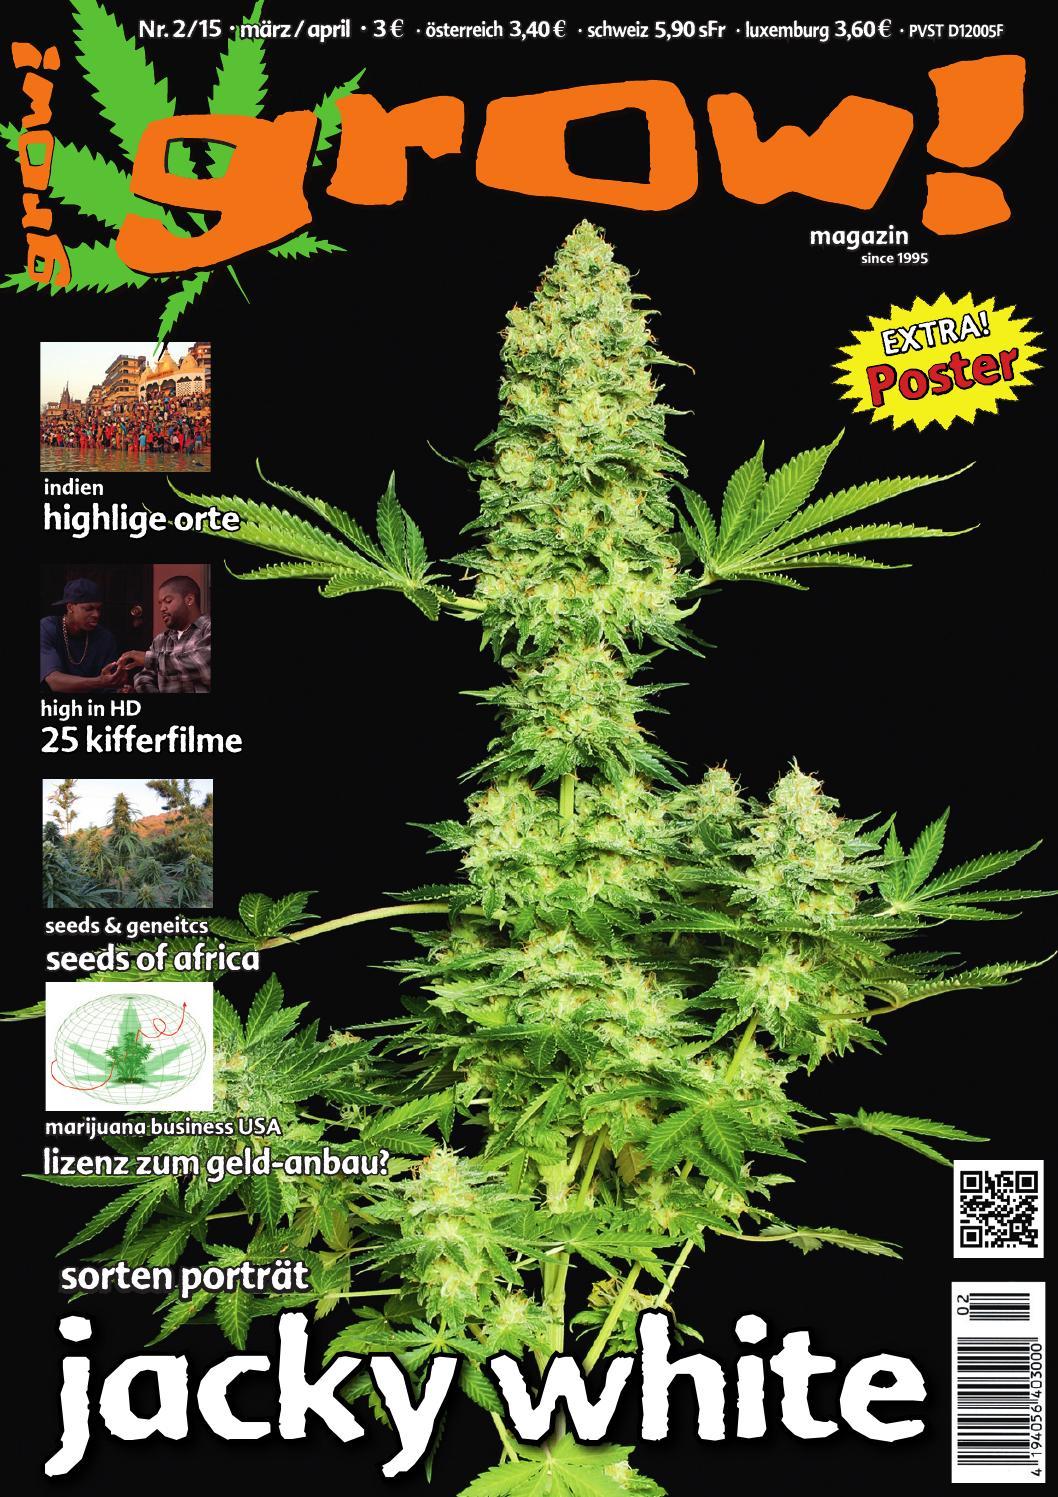 Grow! magazin 2 15 by grow! Magazin - issuu